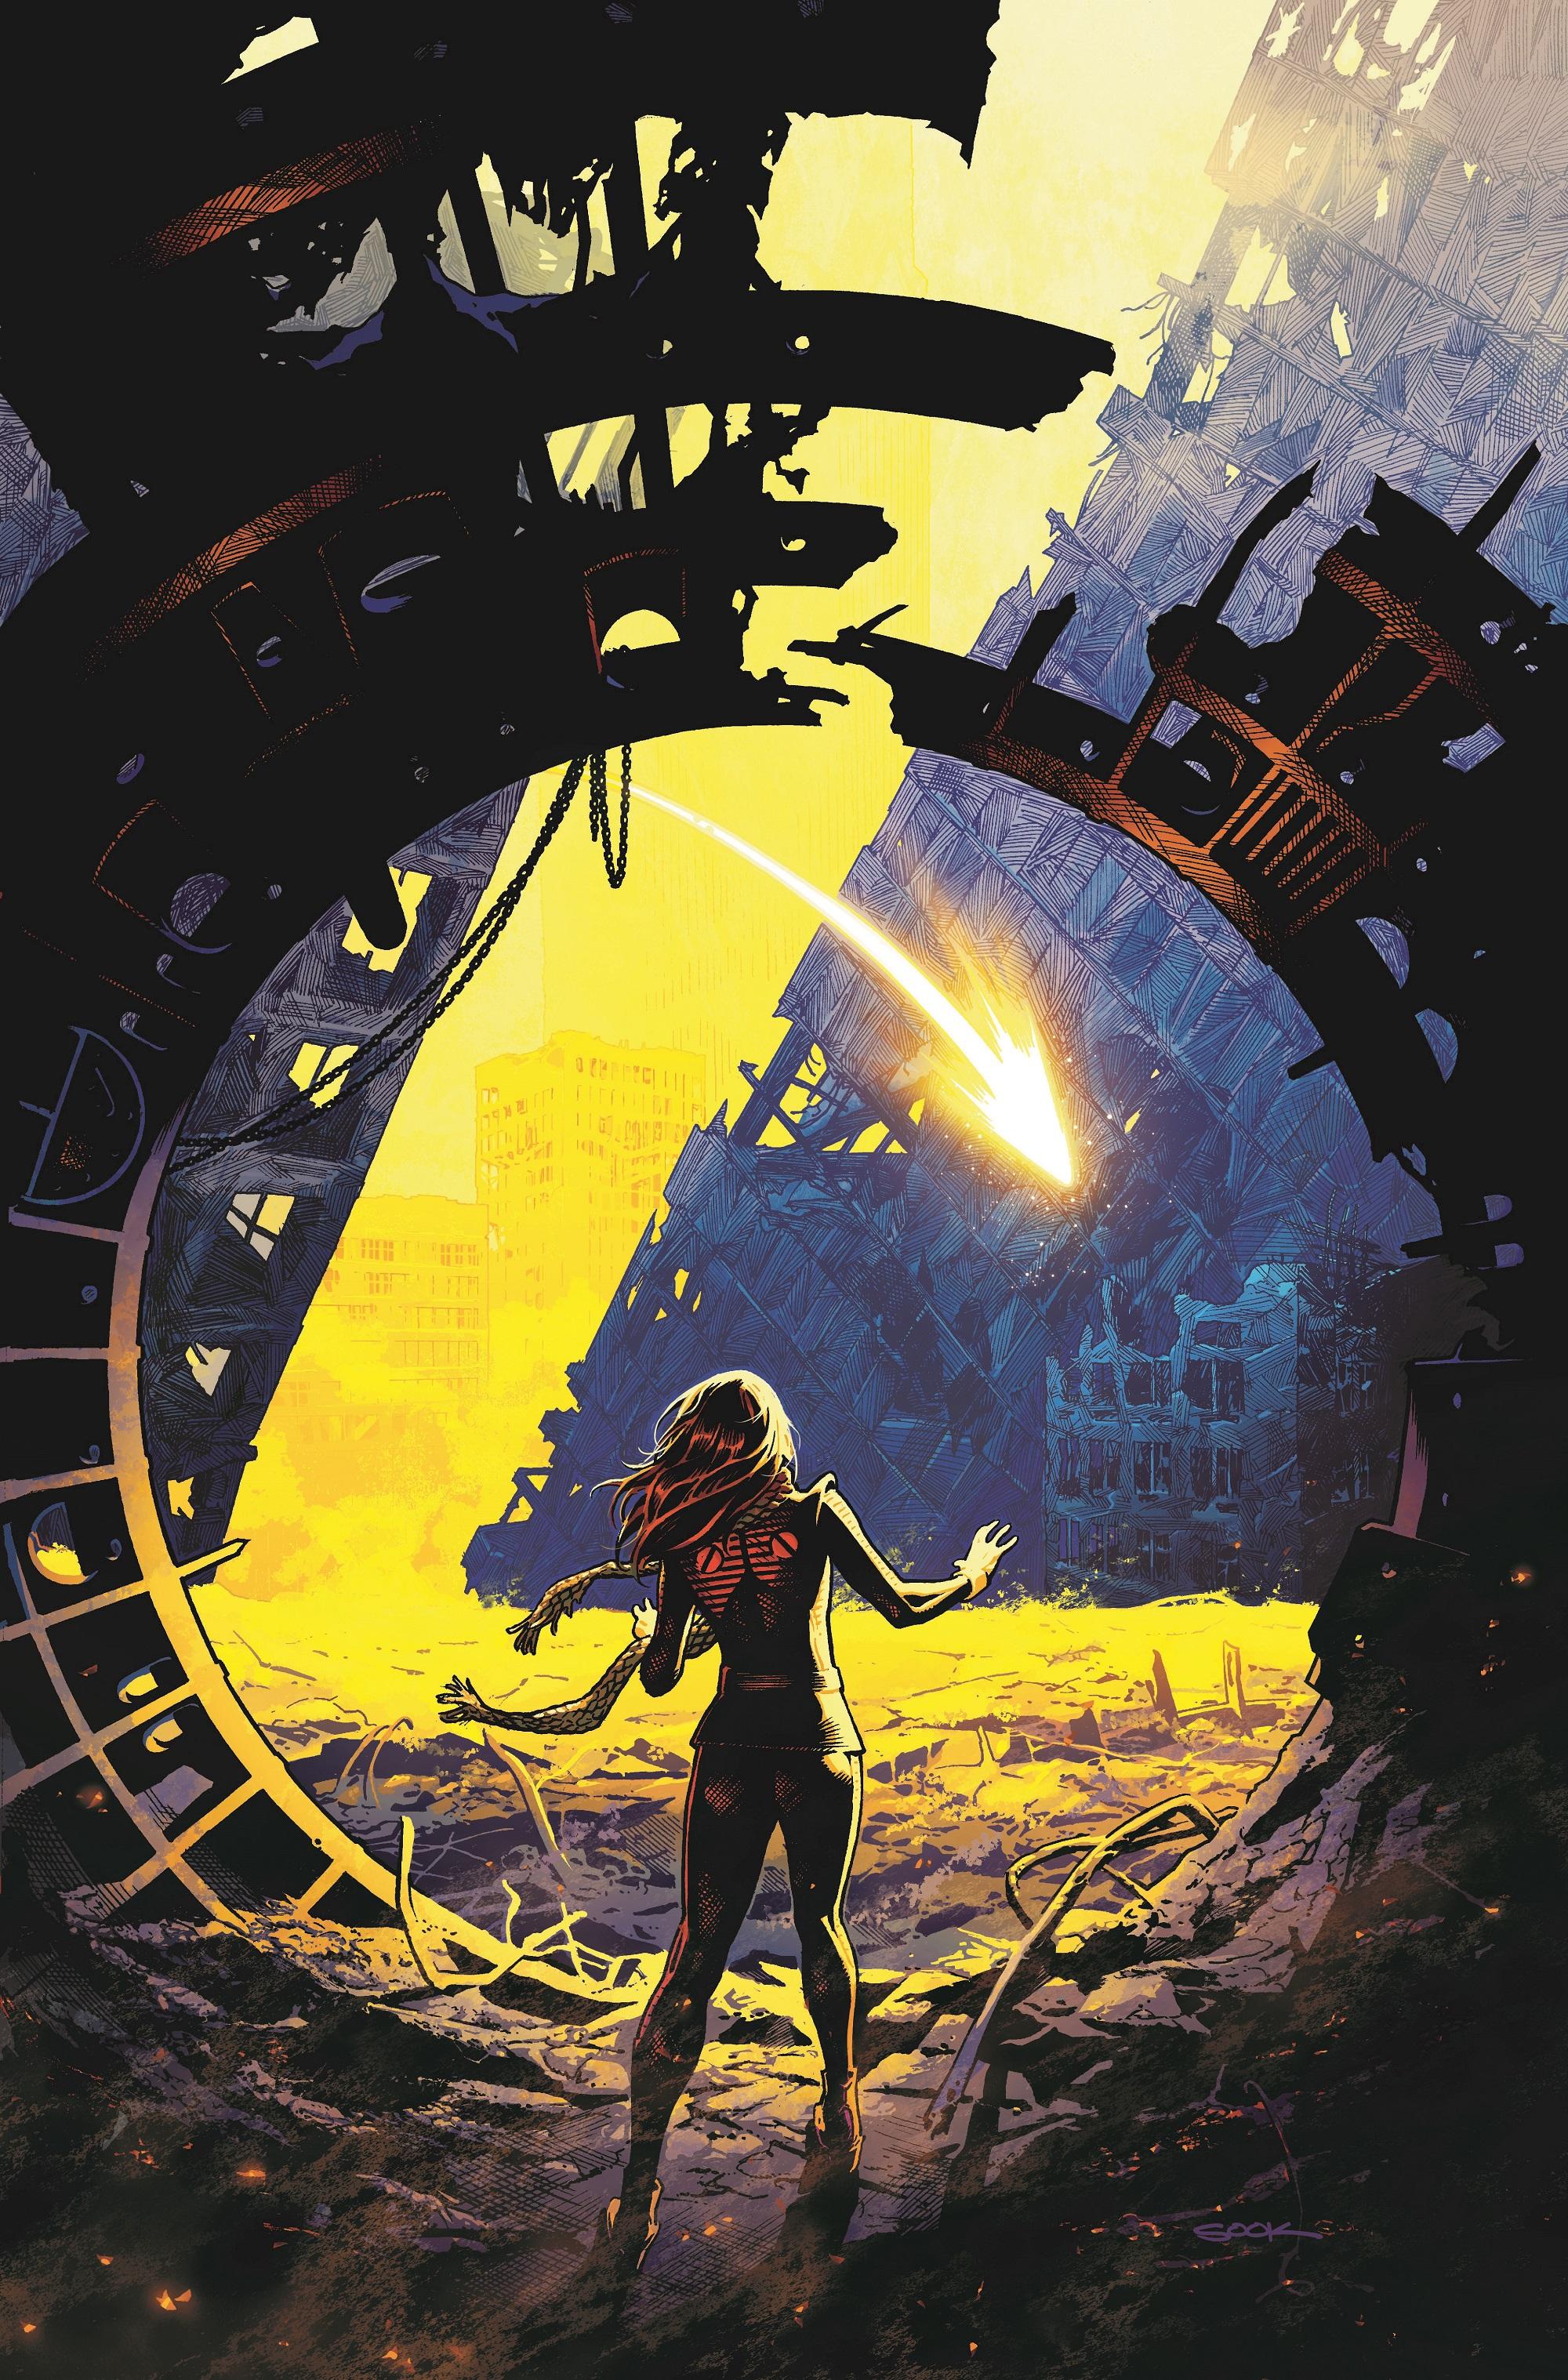 Bendis and Sook bring back the Legion of Super-Heroes